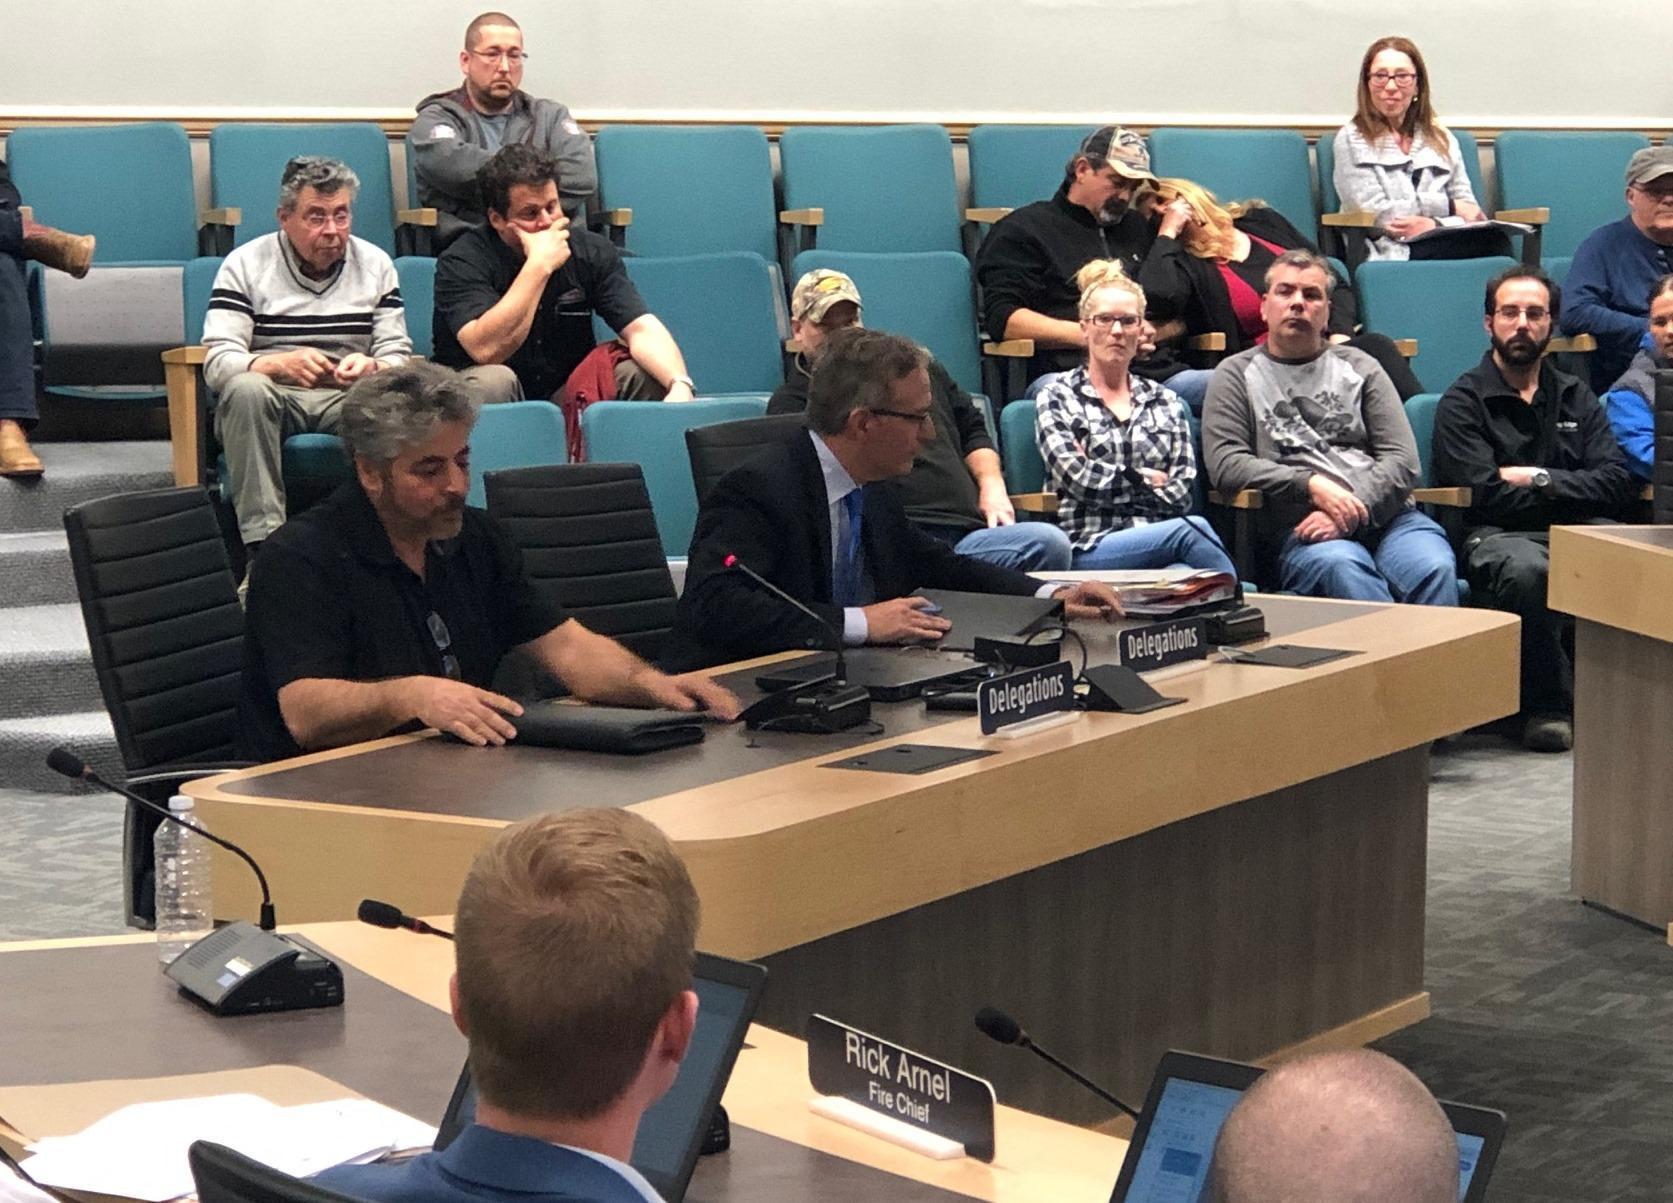 Essex says No to Permanent Fireworks Storage Facility